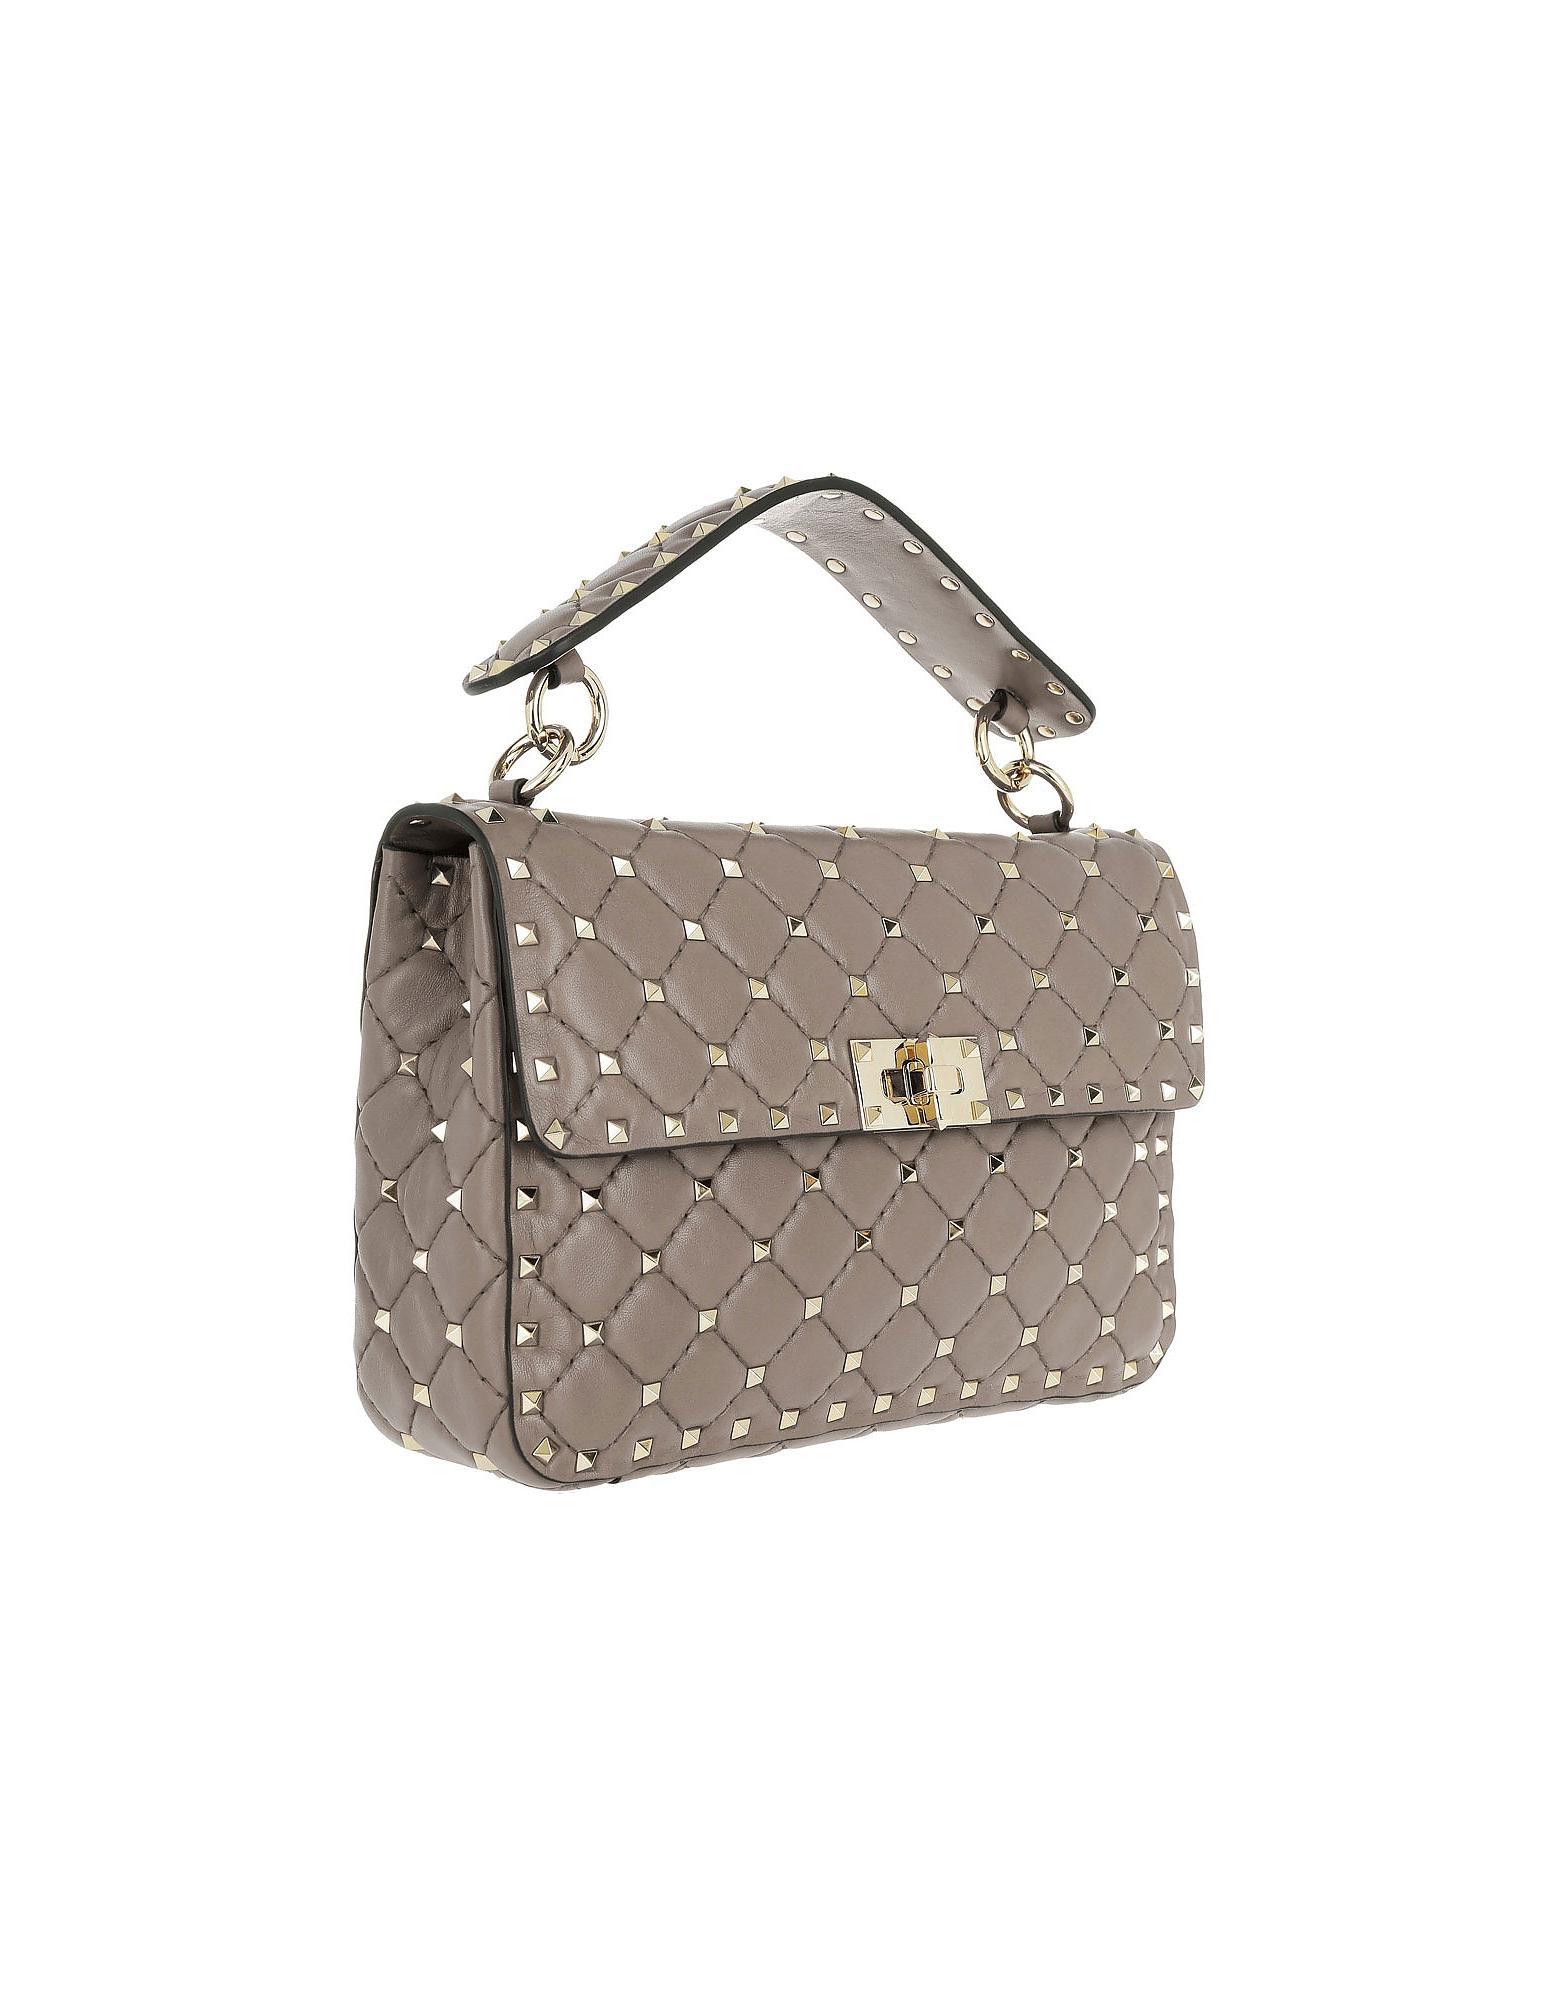 c79c0db26be1 Lyst - Valentino Rockstud Spike Crossbody Bag Medium Poudre in Natural